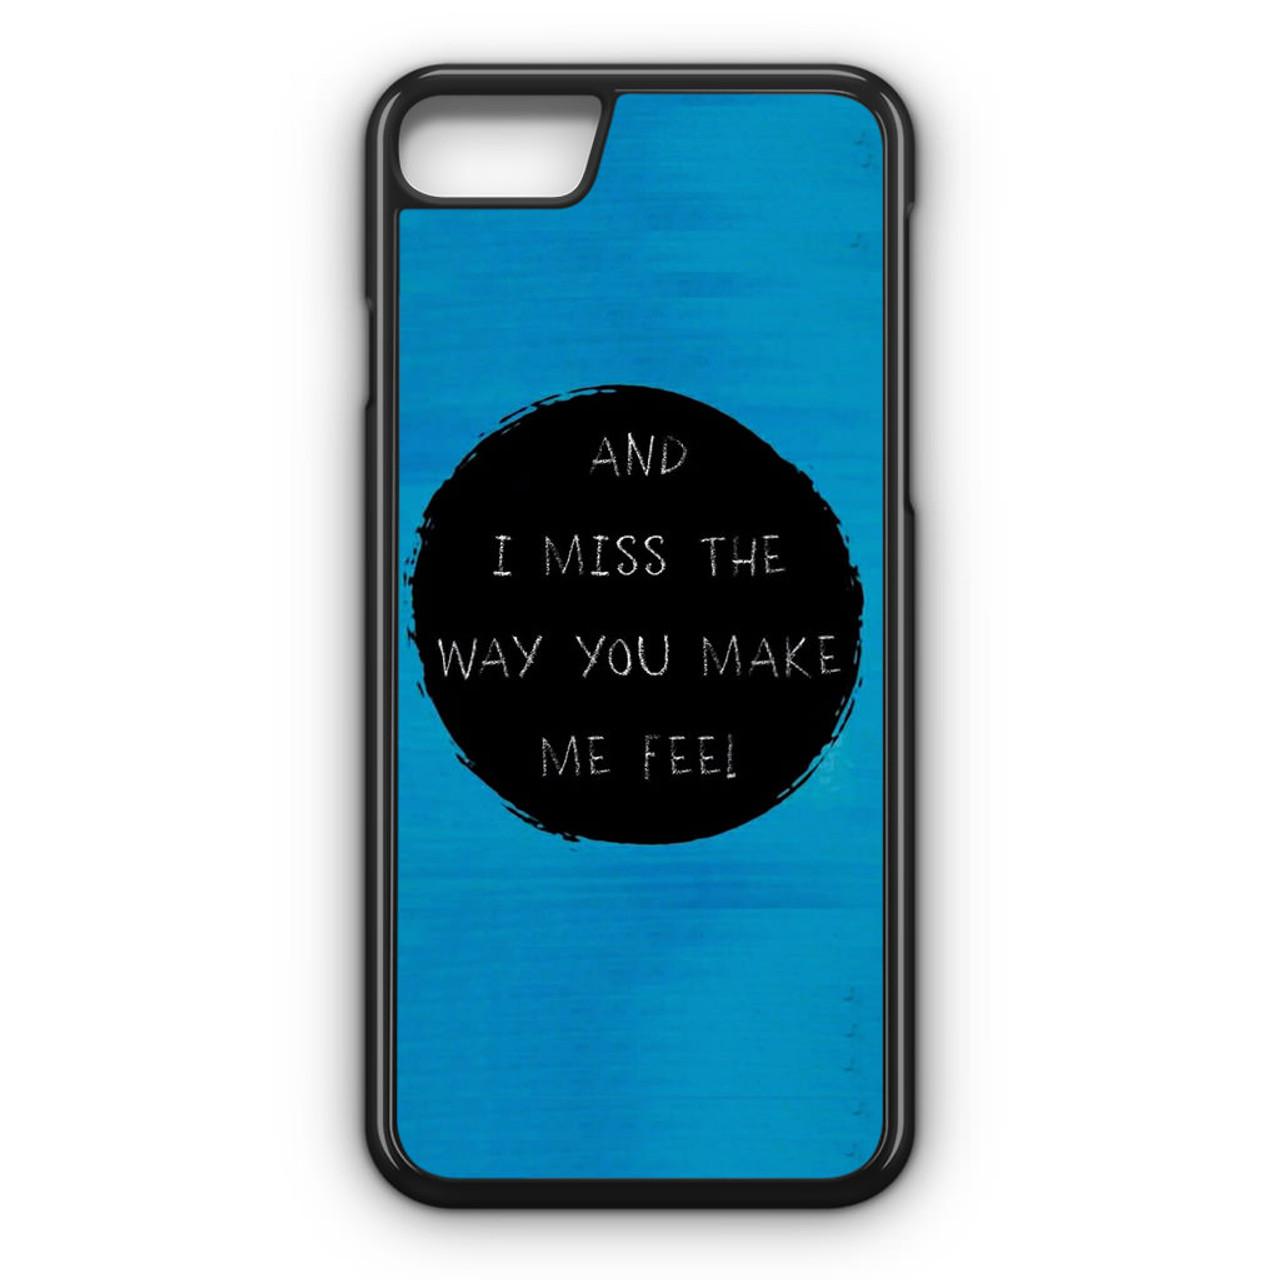 ed sheeran phone case iphone 8